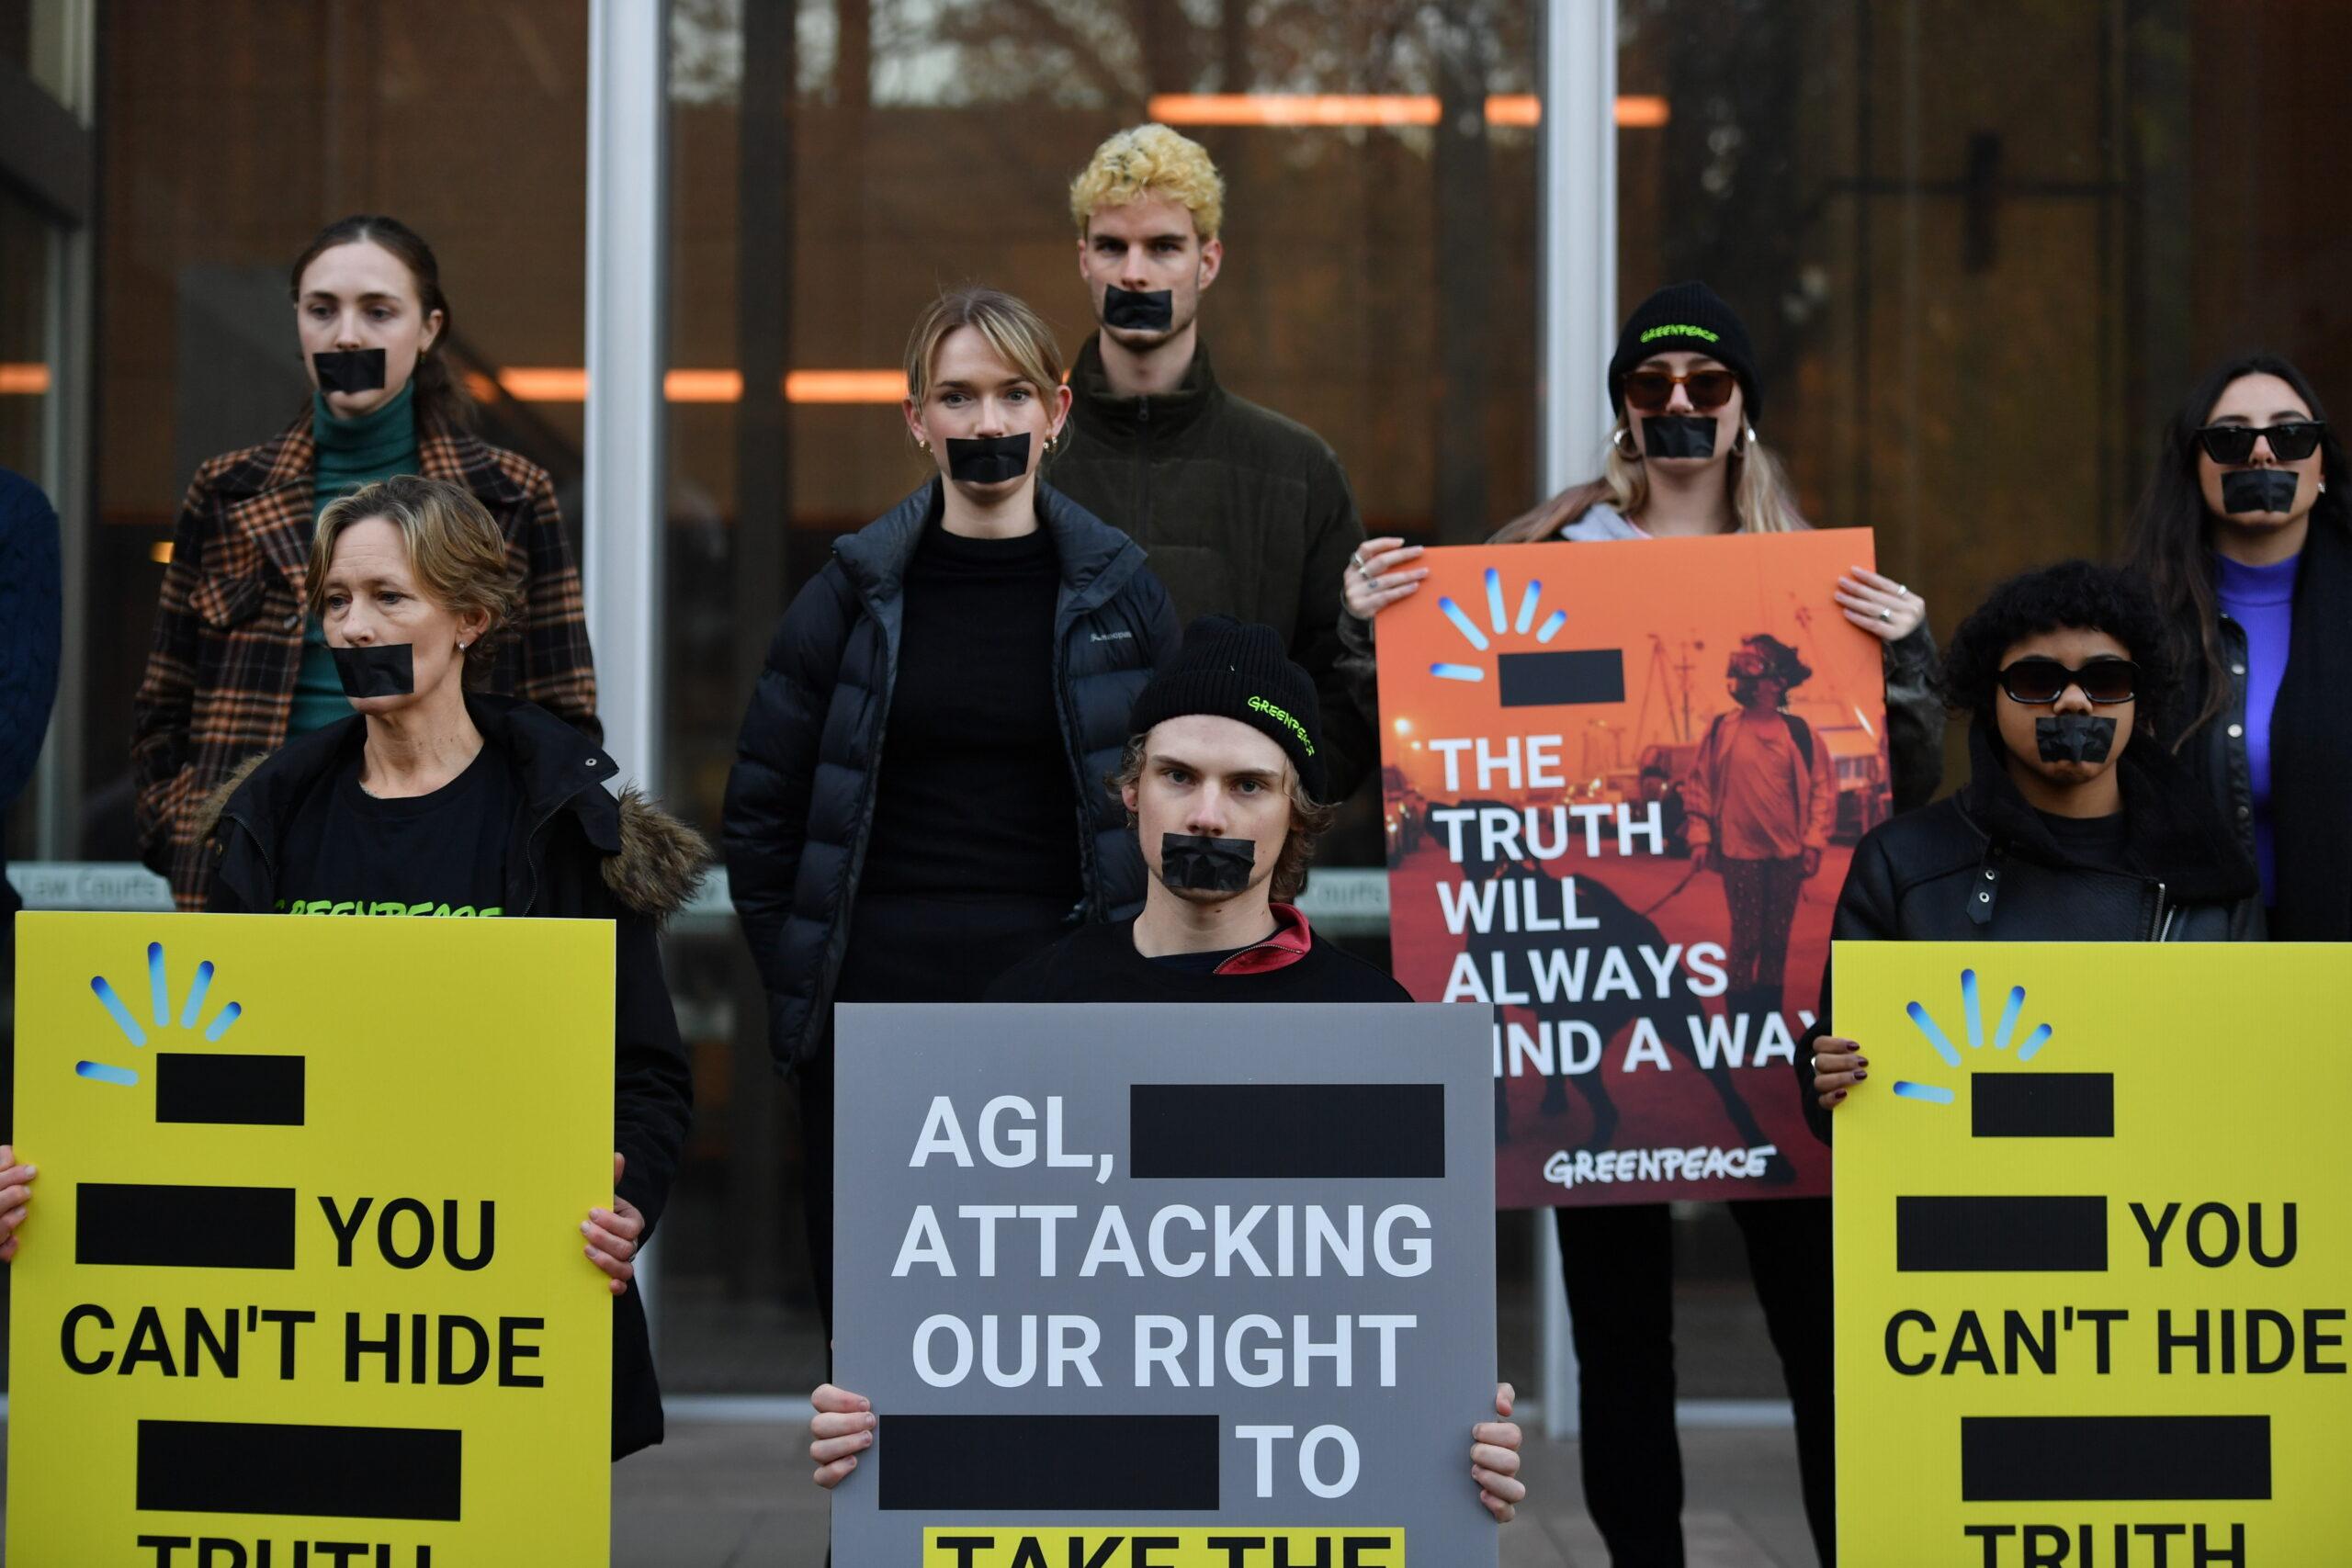 Court Clears Greenpeace's Use Of AGL Energy Logo